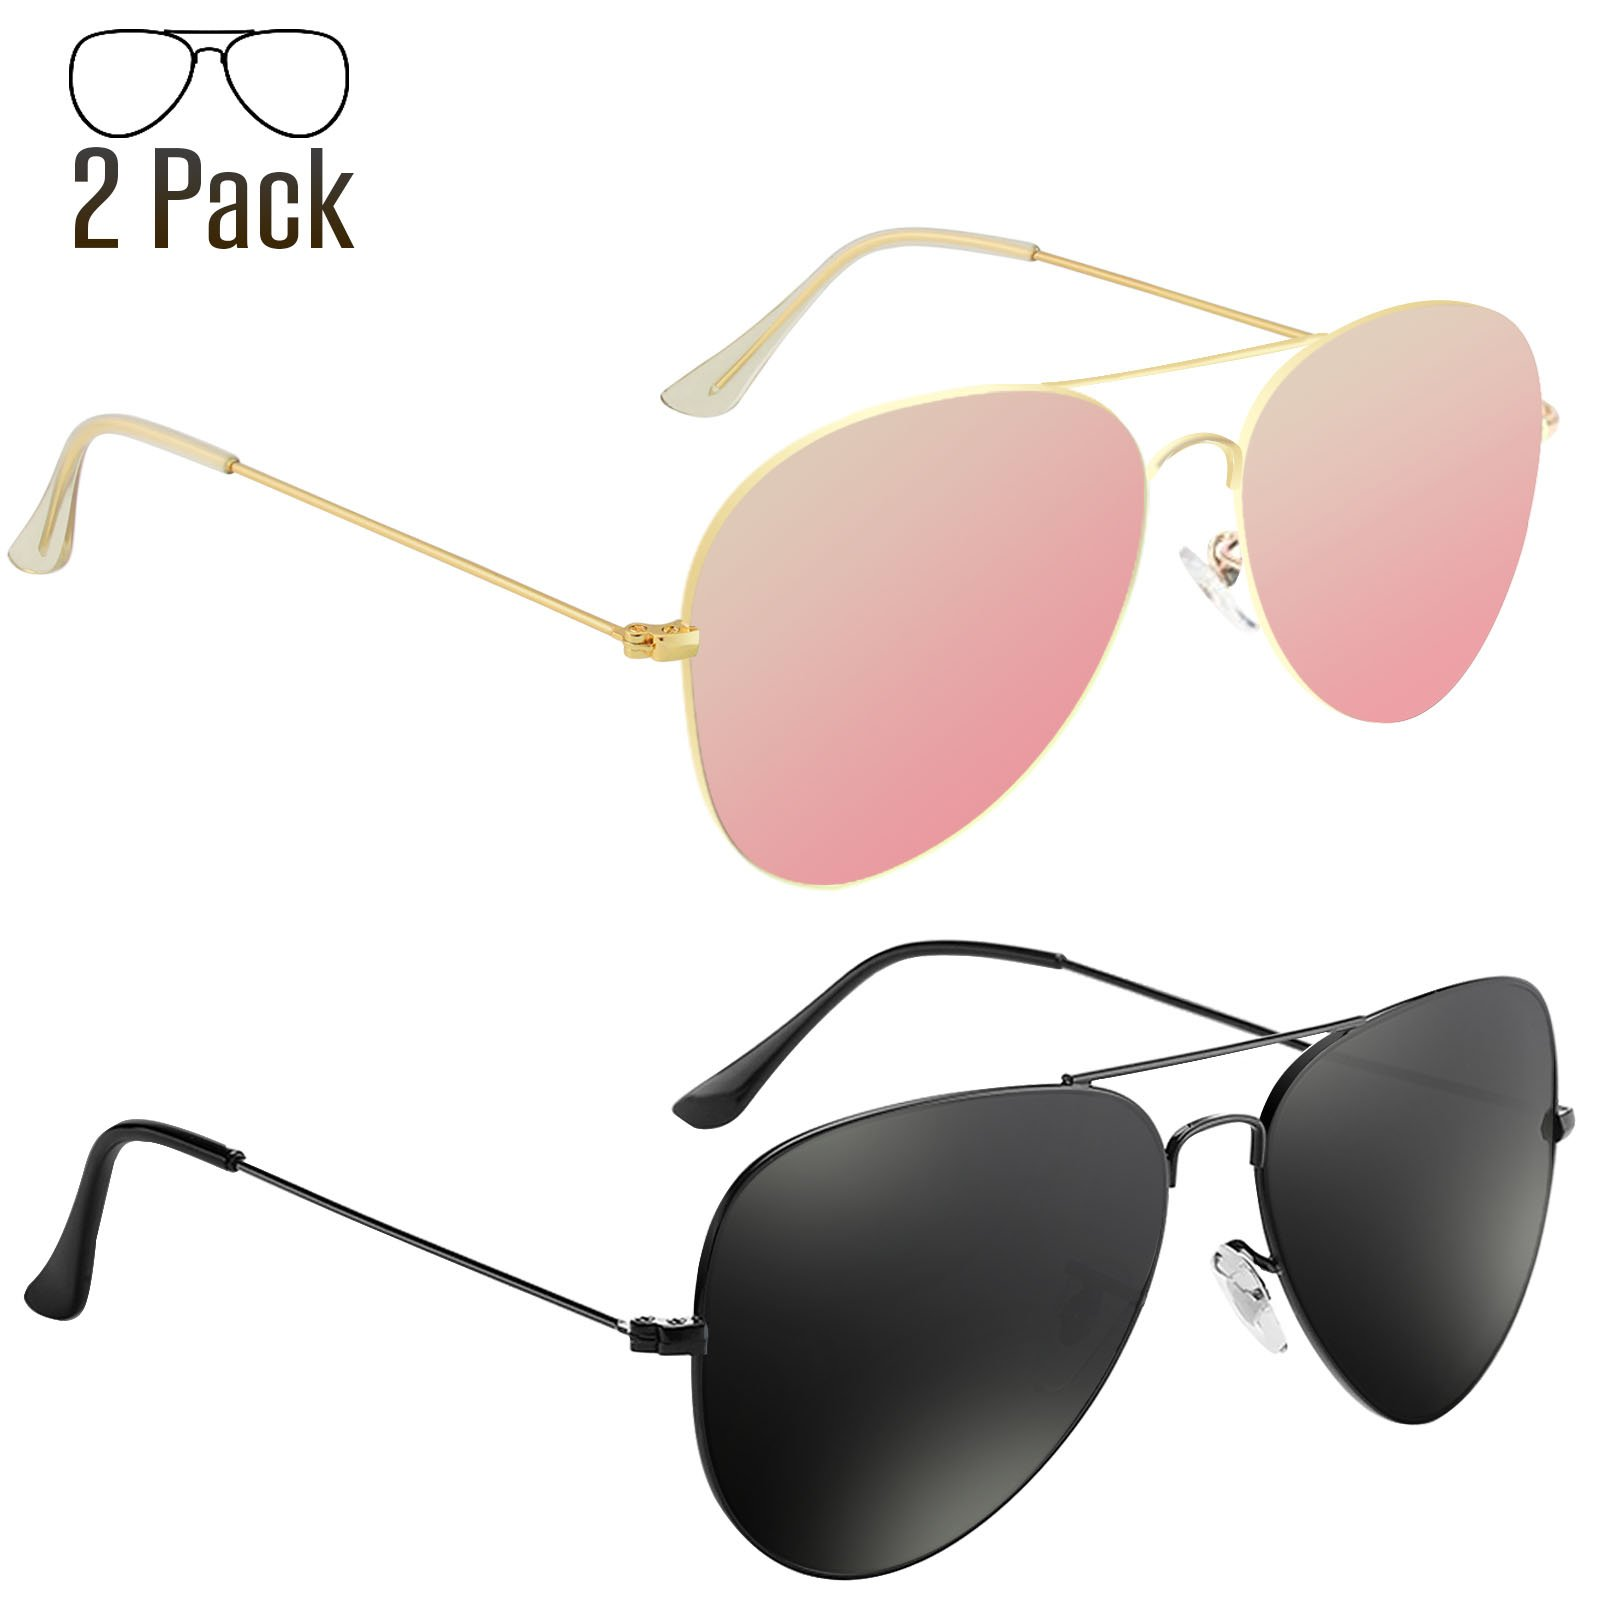 Livhò G Sunglasses for Men Women Aviator Polarized Metal Mirror UV 400 Lens Protection (Black Grey+Sakura powder.) by Livhò